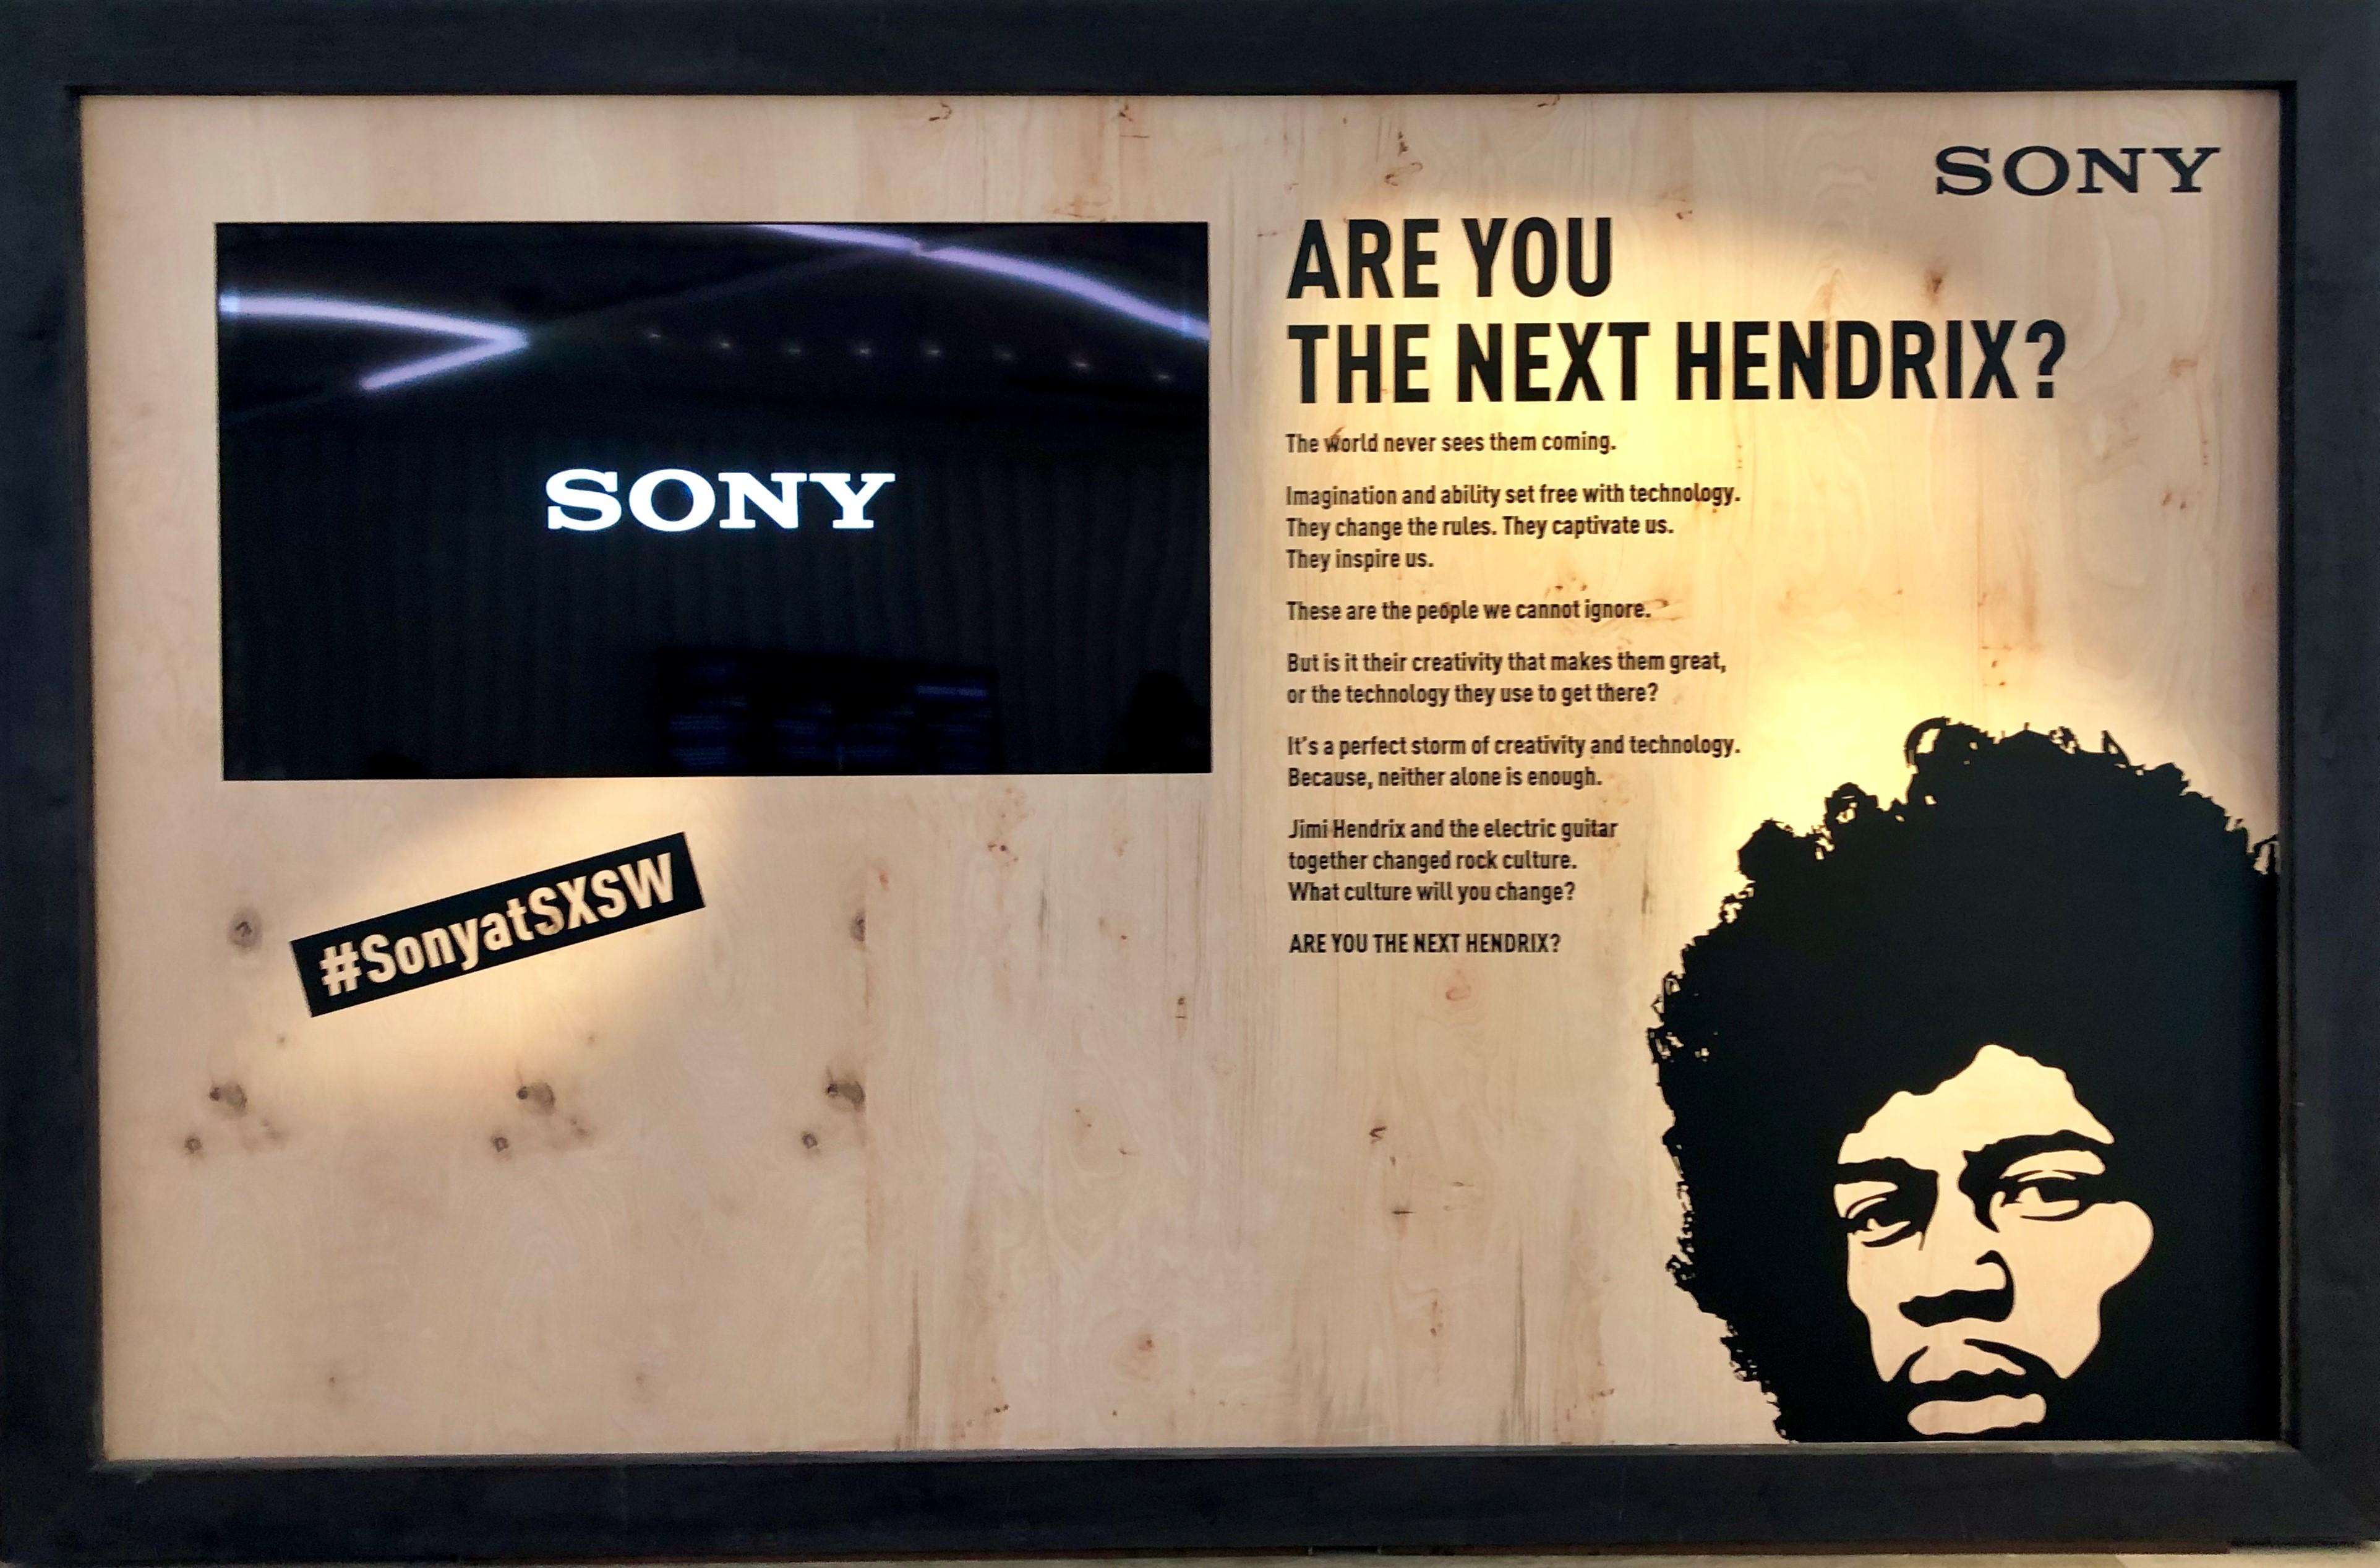 Sony SXSW 2019 Title